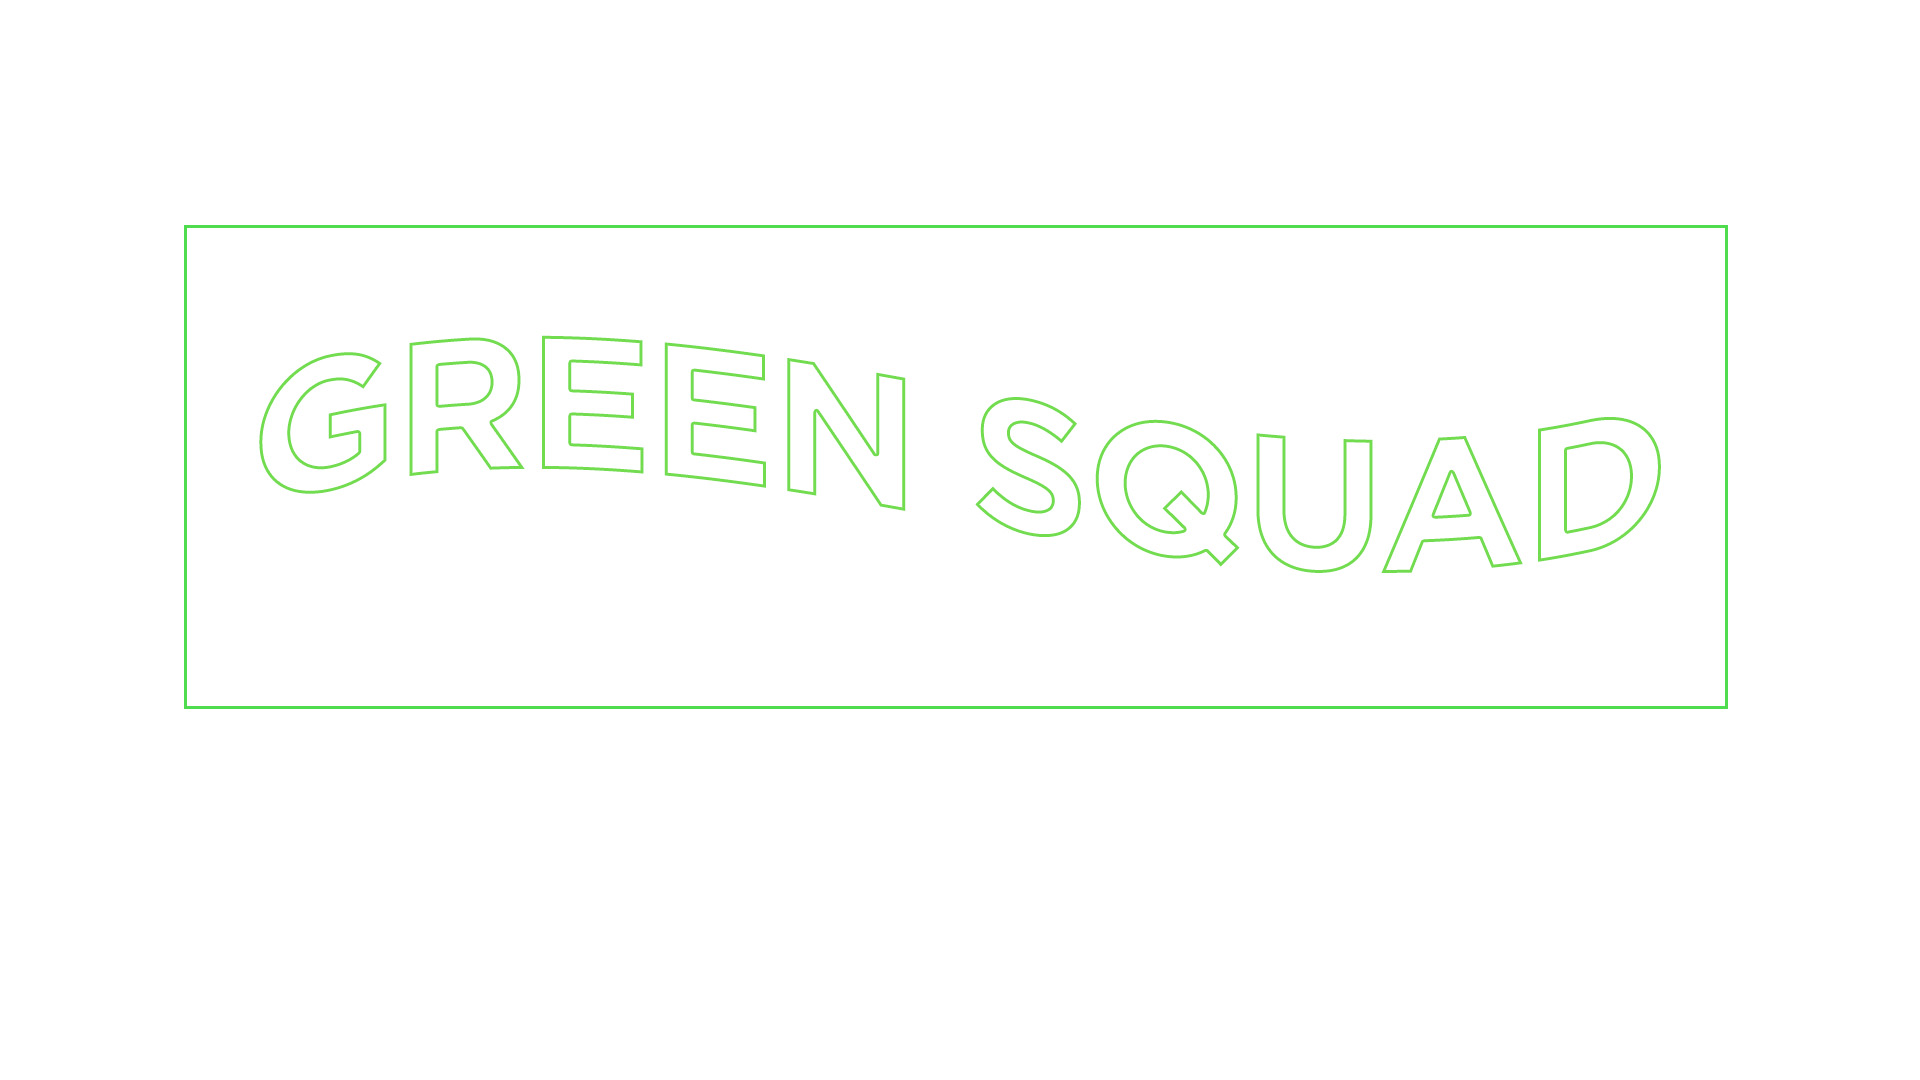 greensquad header.jpg